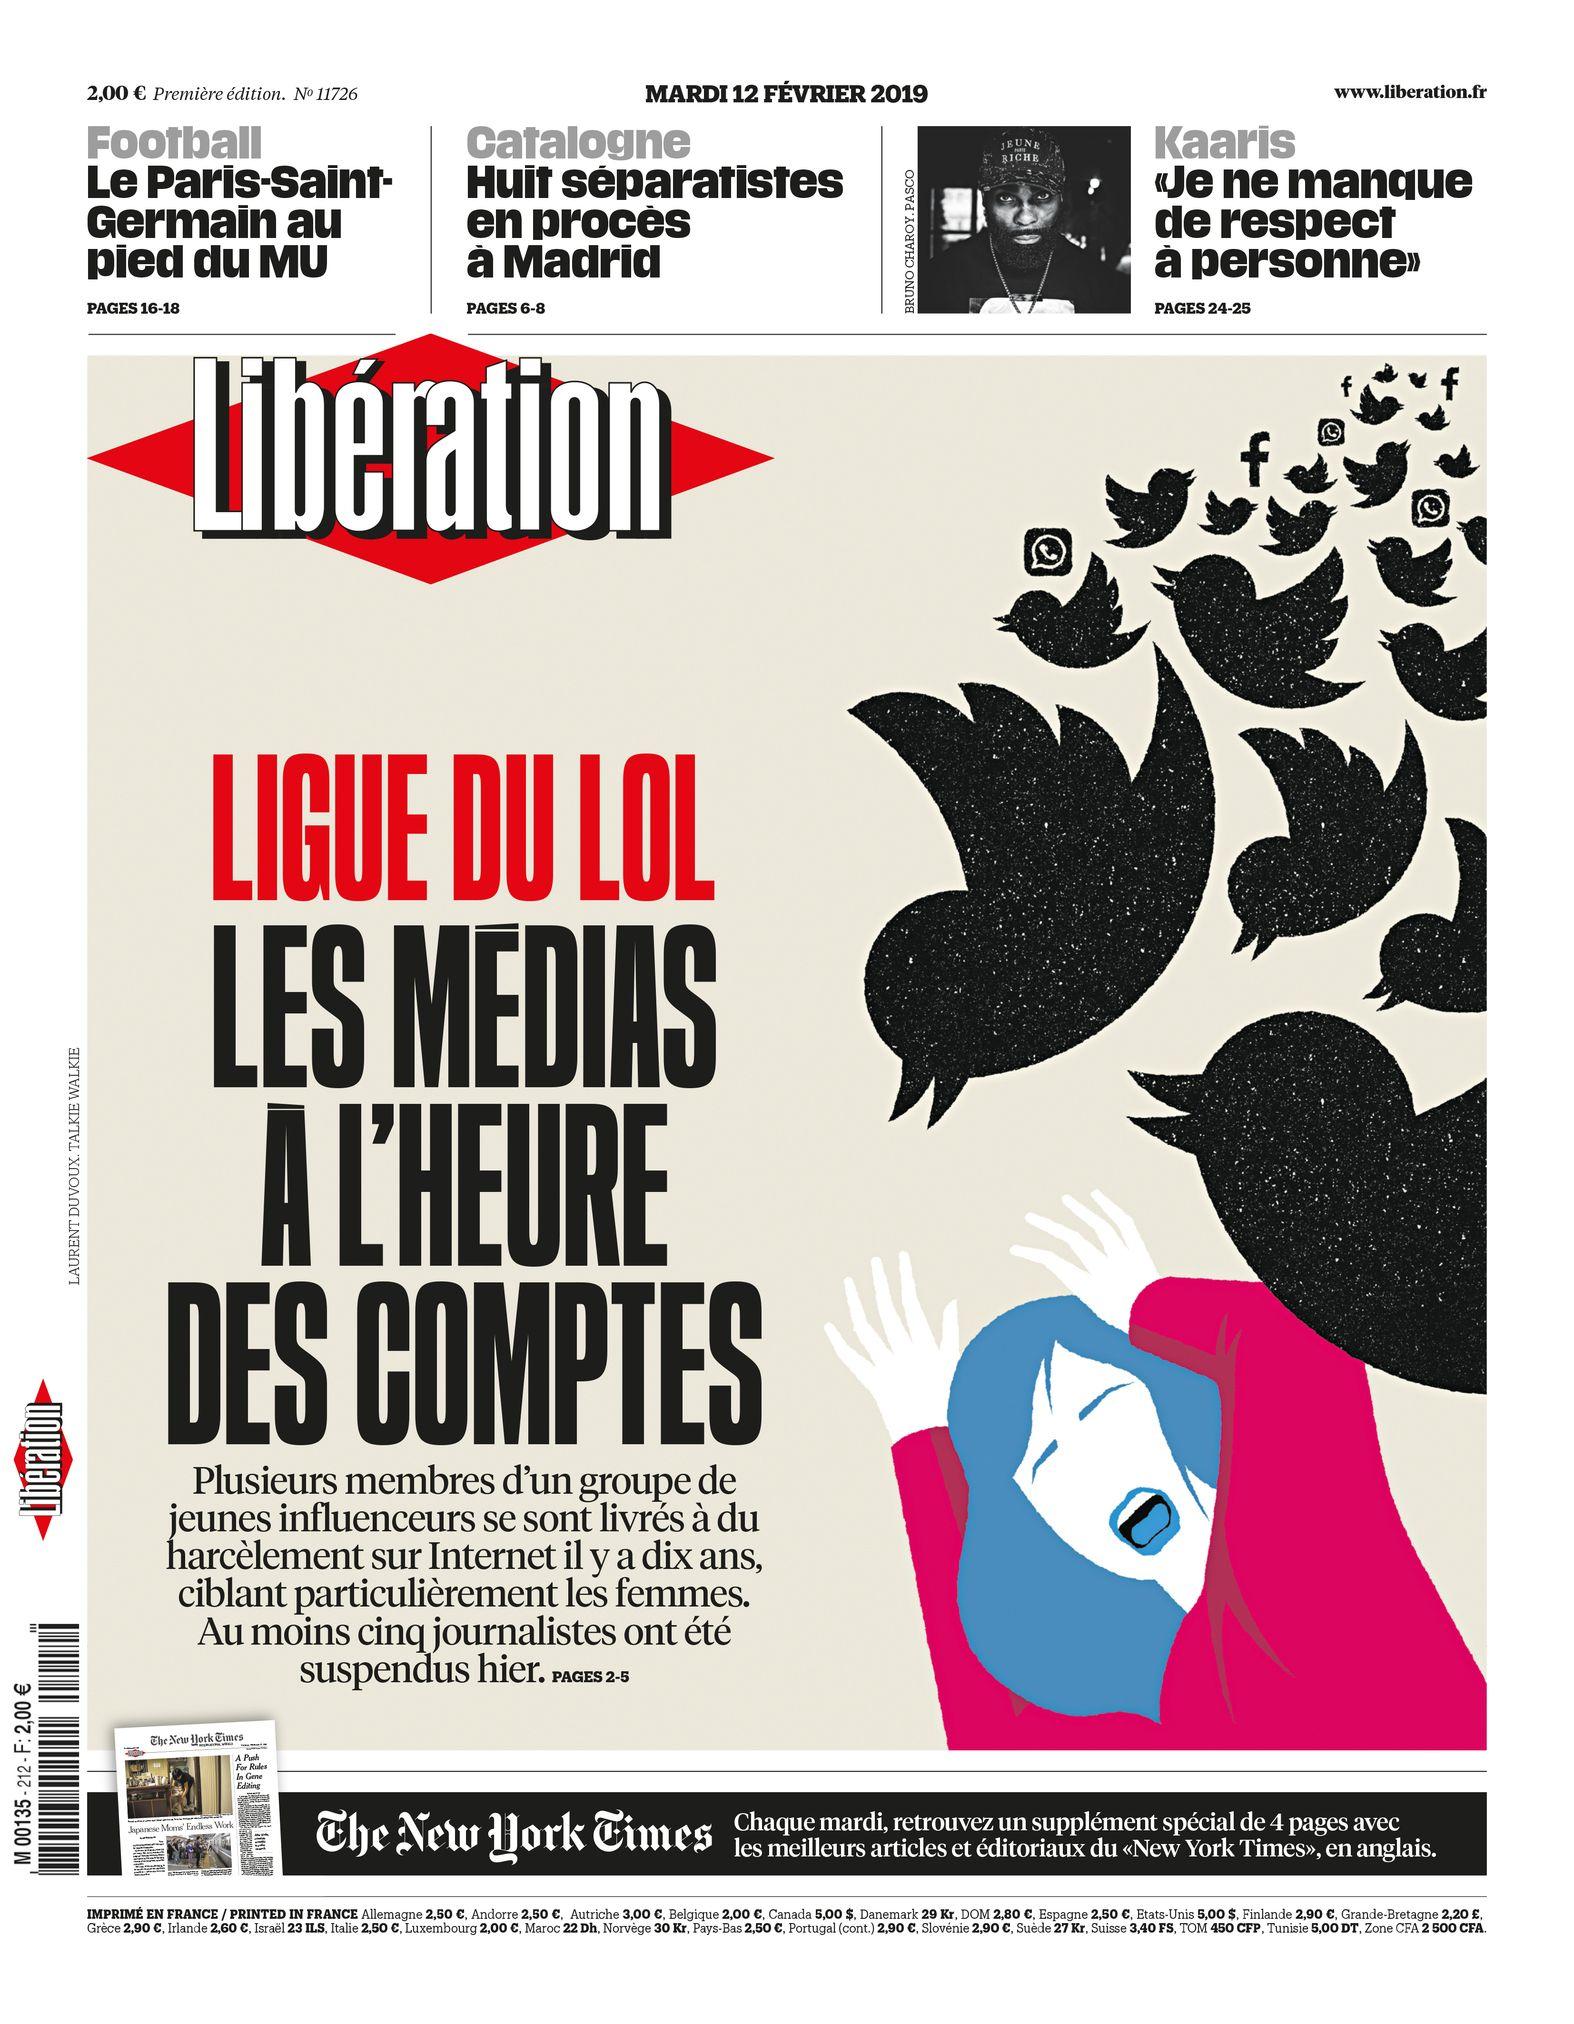 garance-illustration-Liberation-Ligue-du-lol_web